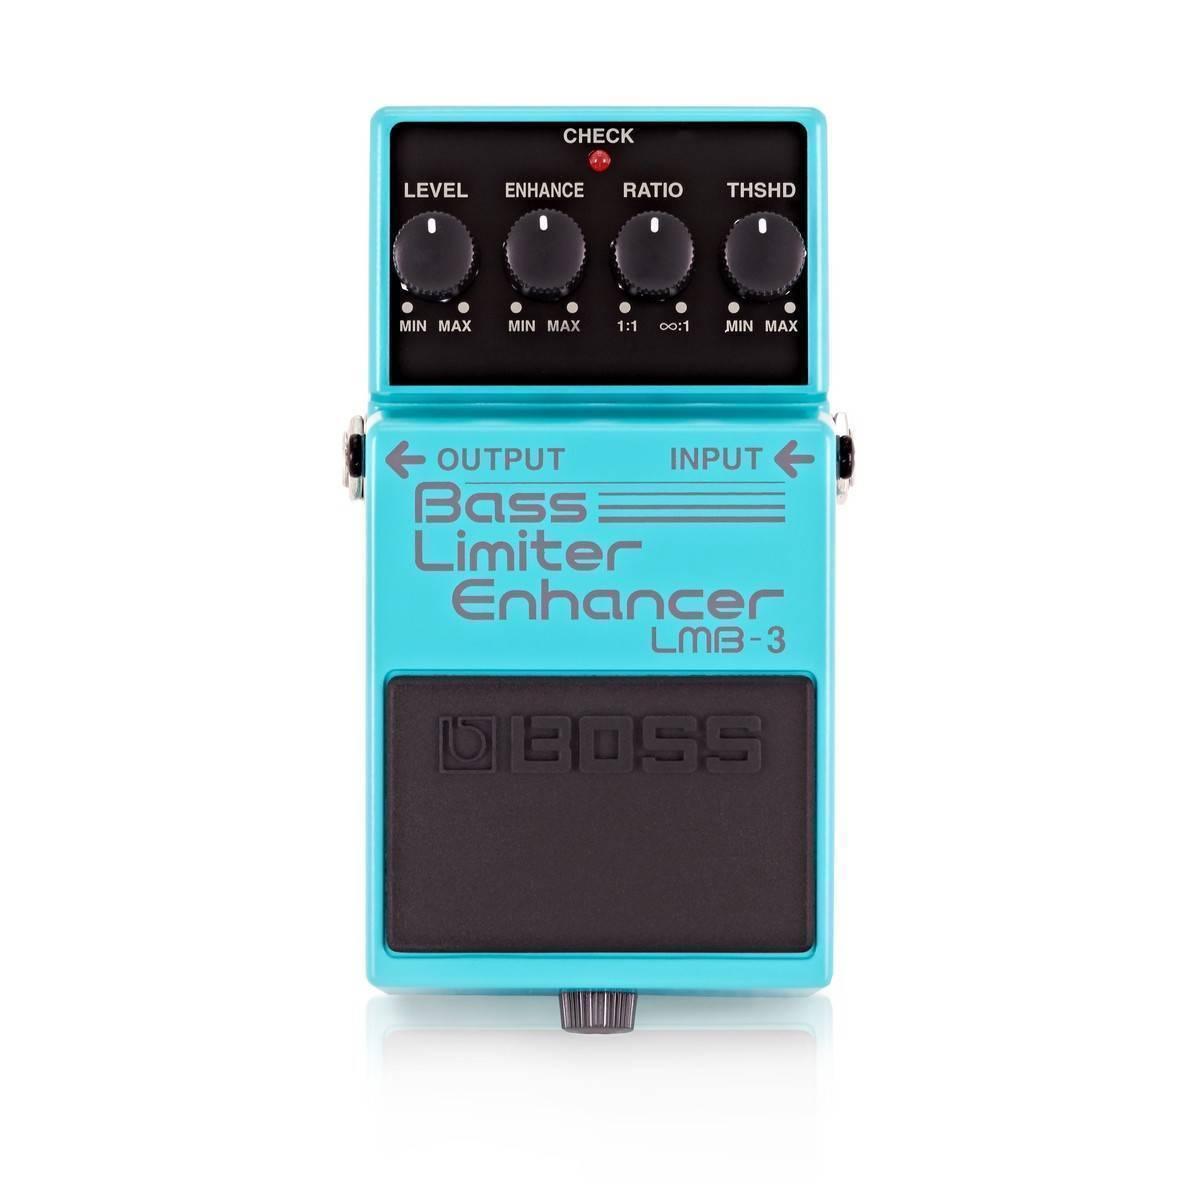 Pedal Compacto p/bajo Bass Limiter/Enhancer